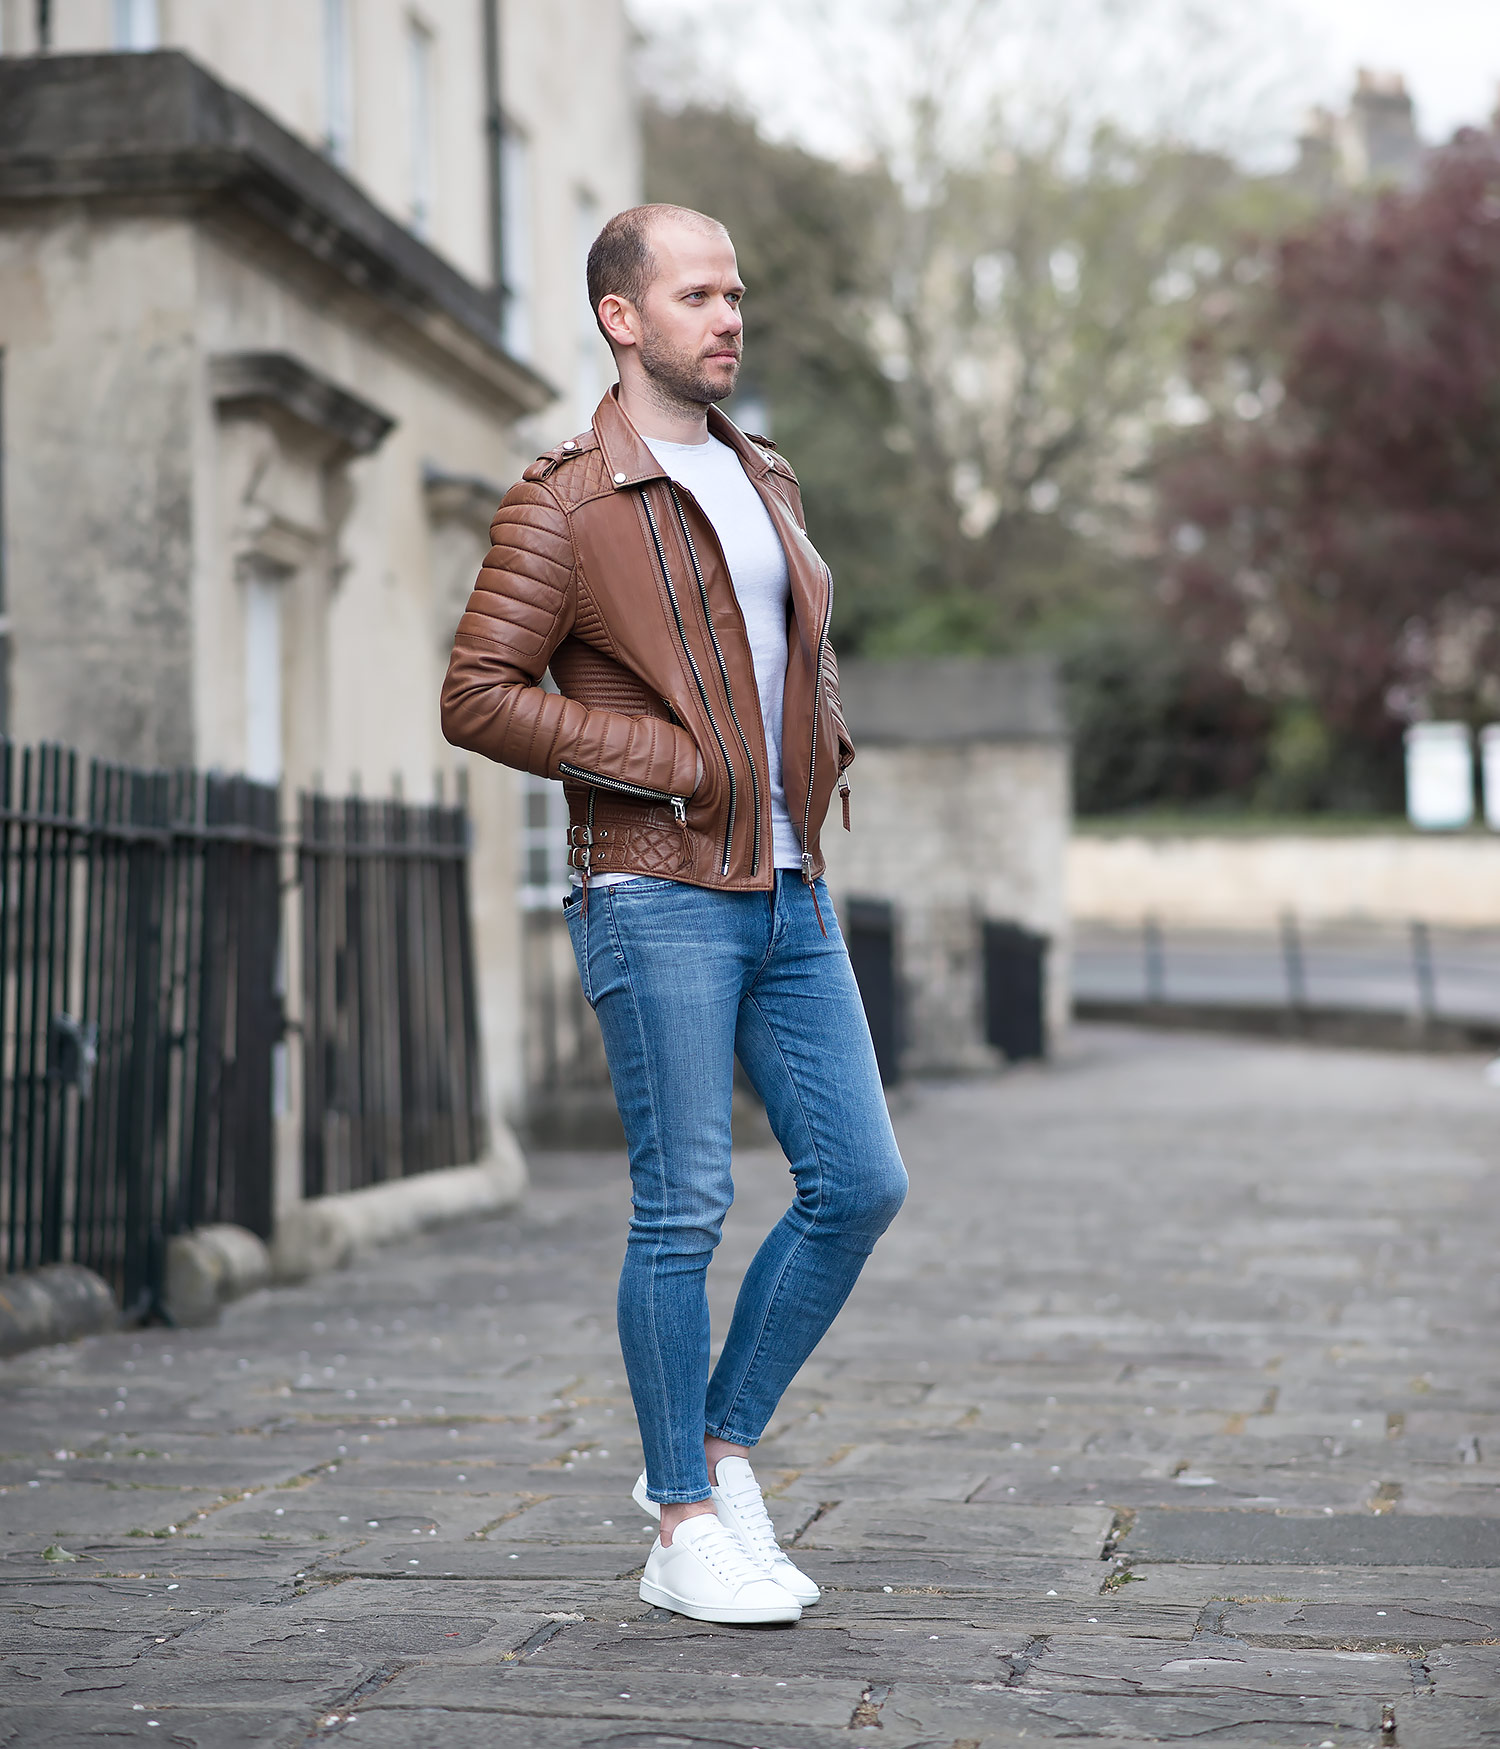 Leather jacket instagram - Mens Street Style Boda Skins Antique Brown Kay Michaels Biker Leather Jacket Instagram